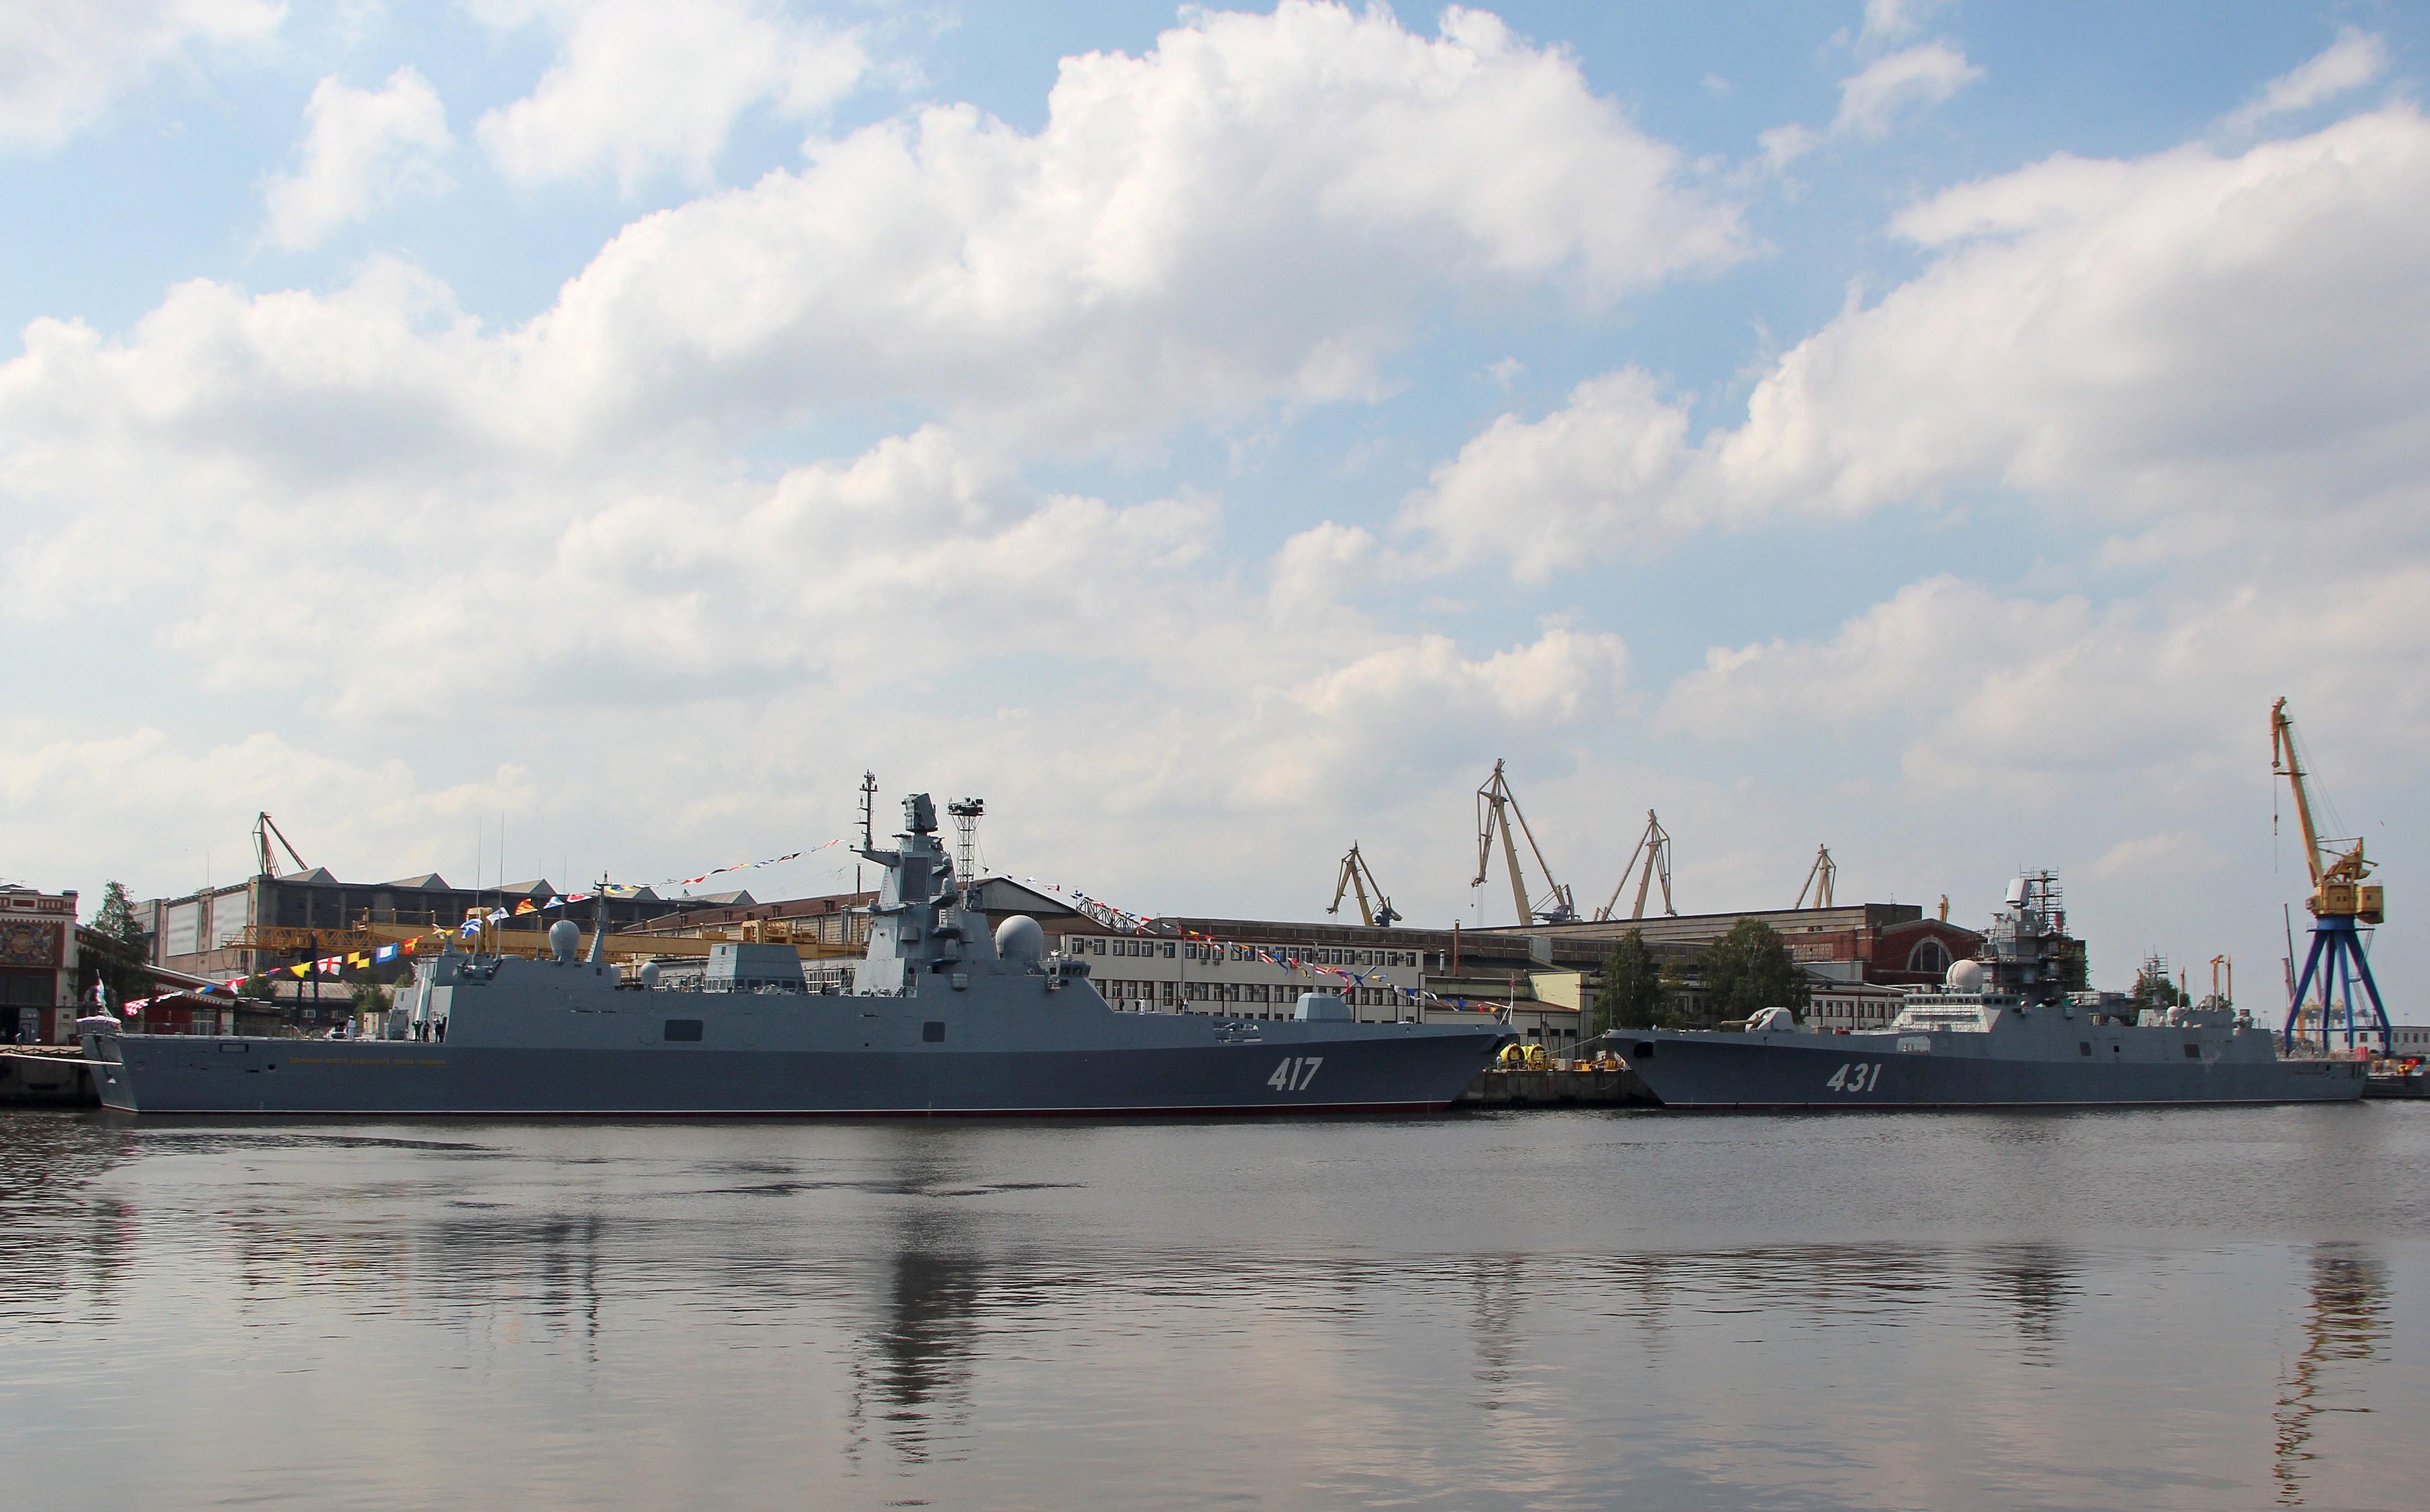 Project 22350: Admiral Sergei Gorshkov - Page 39 28-6517905-22350-afss-gorshkov-i-af-kasatonov-sv-28.07.2018